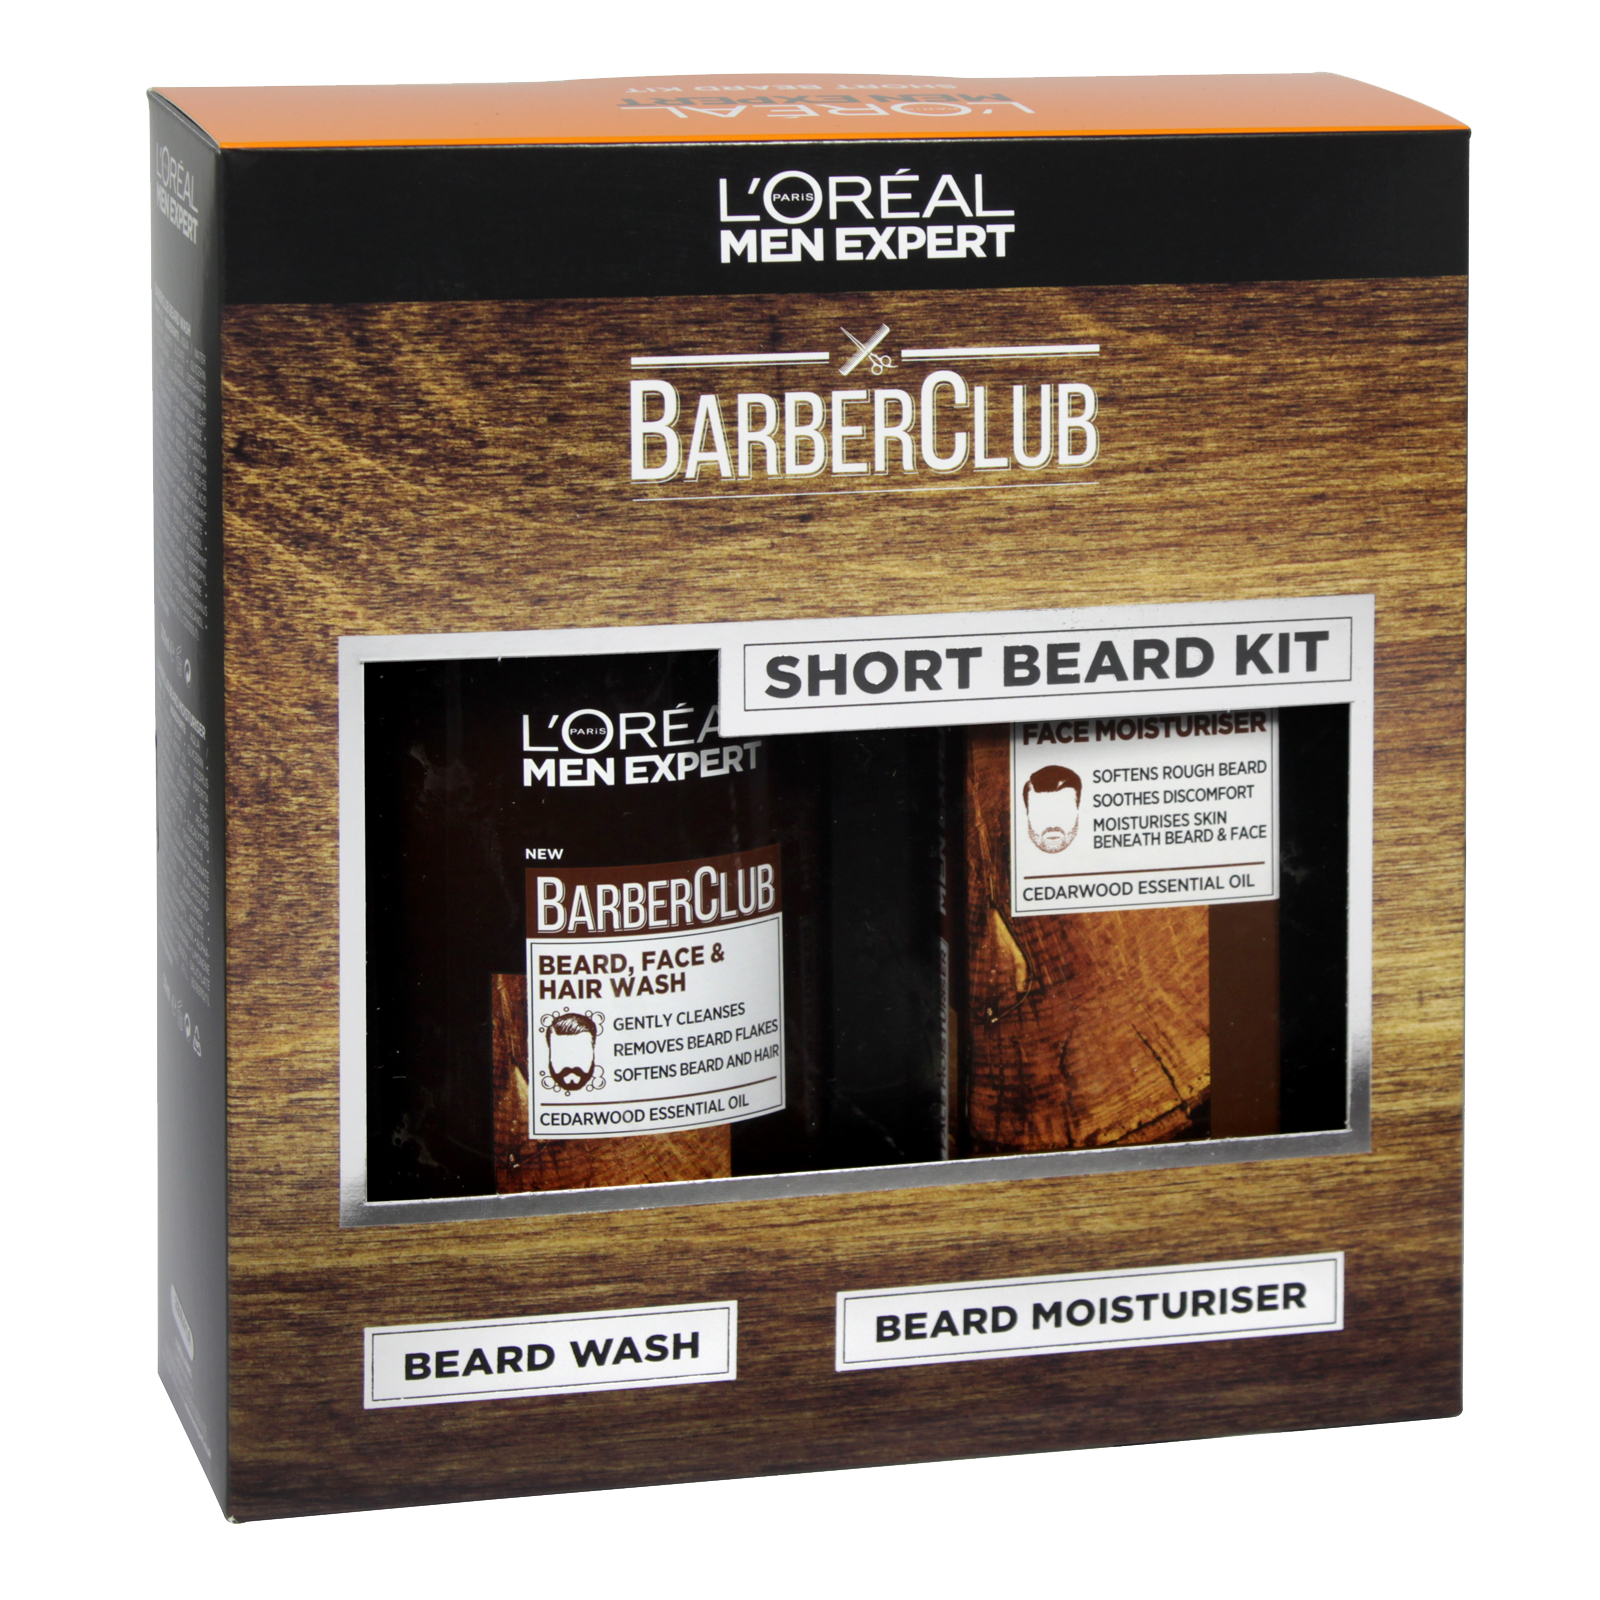 LOREAL MEN EXPERT BARBER CLUB SHORT BEARD KIT 200ML BEARD WASH+BEARD MOISTURISER